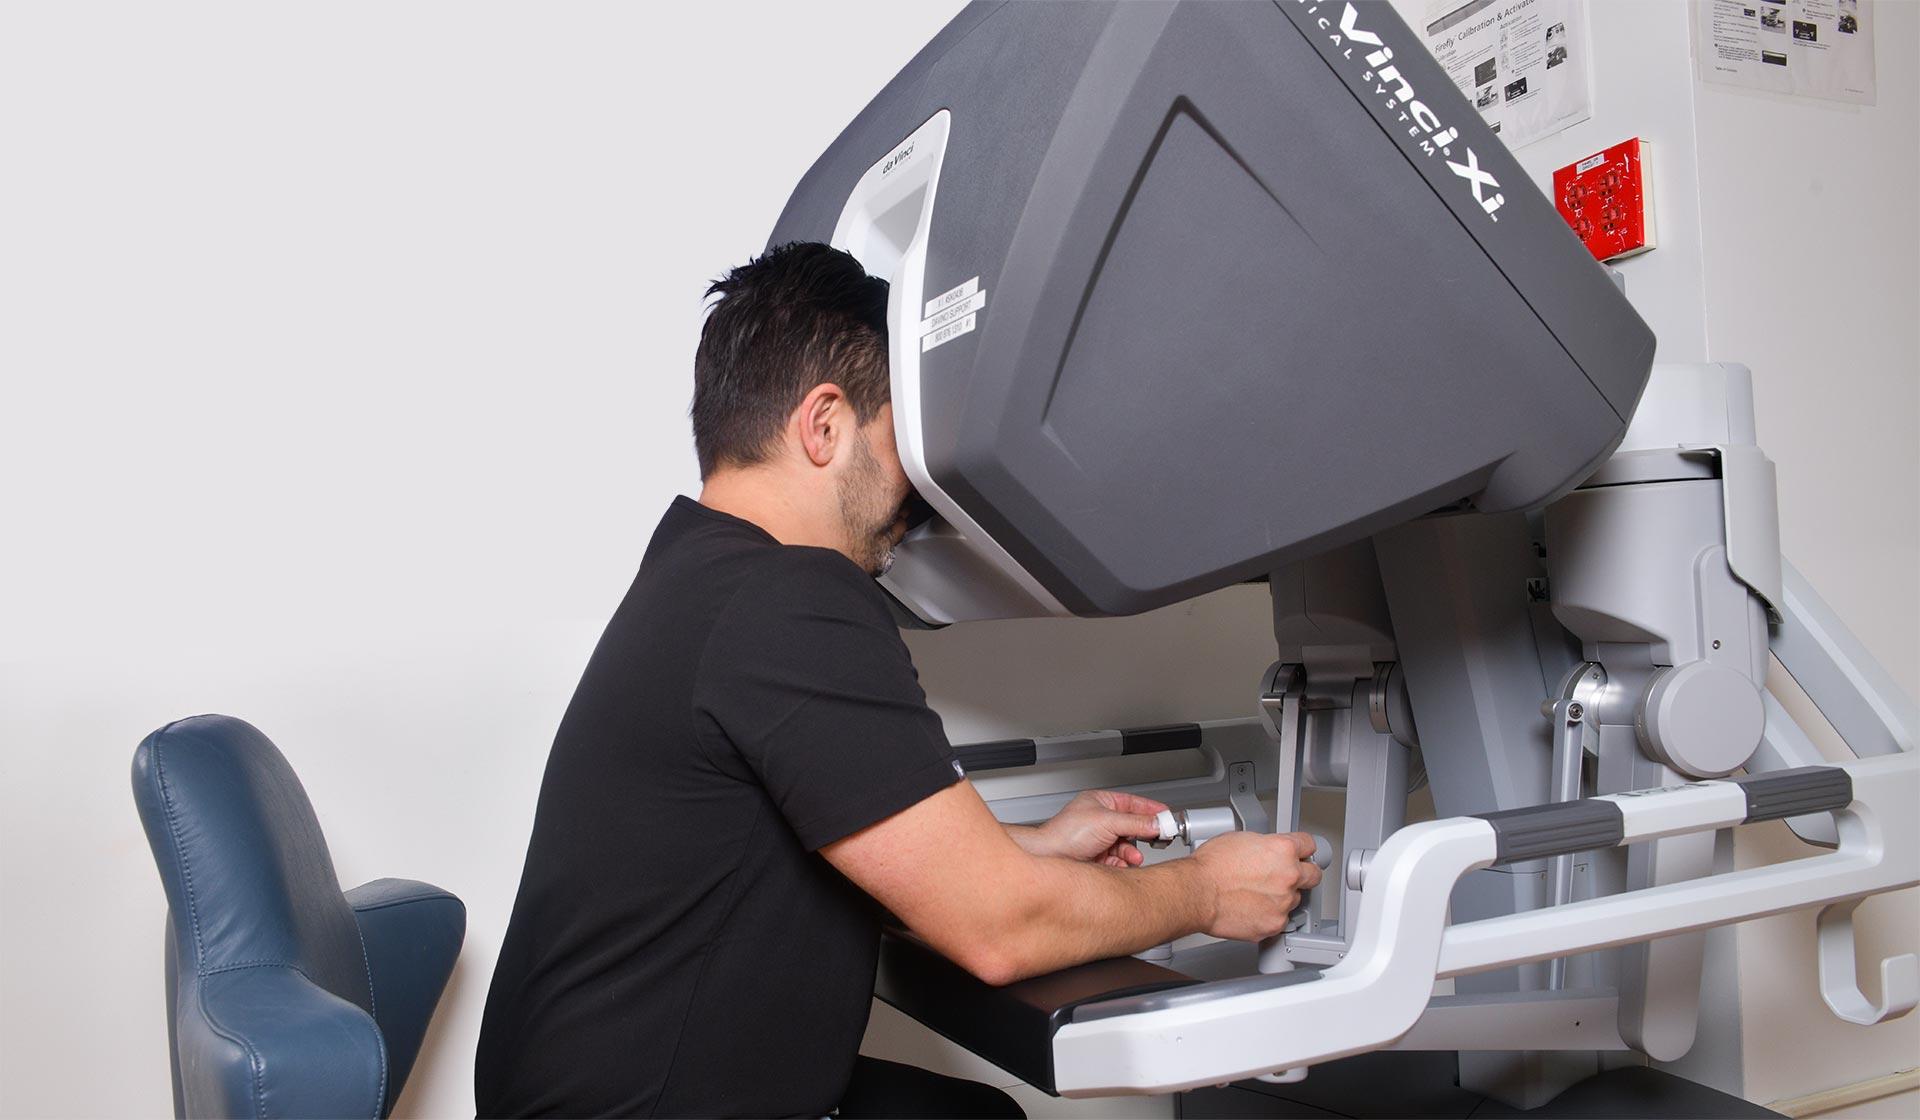 Danny Shouhed MD with Da Vinci robotic surgical system.